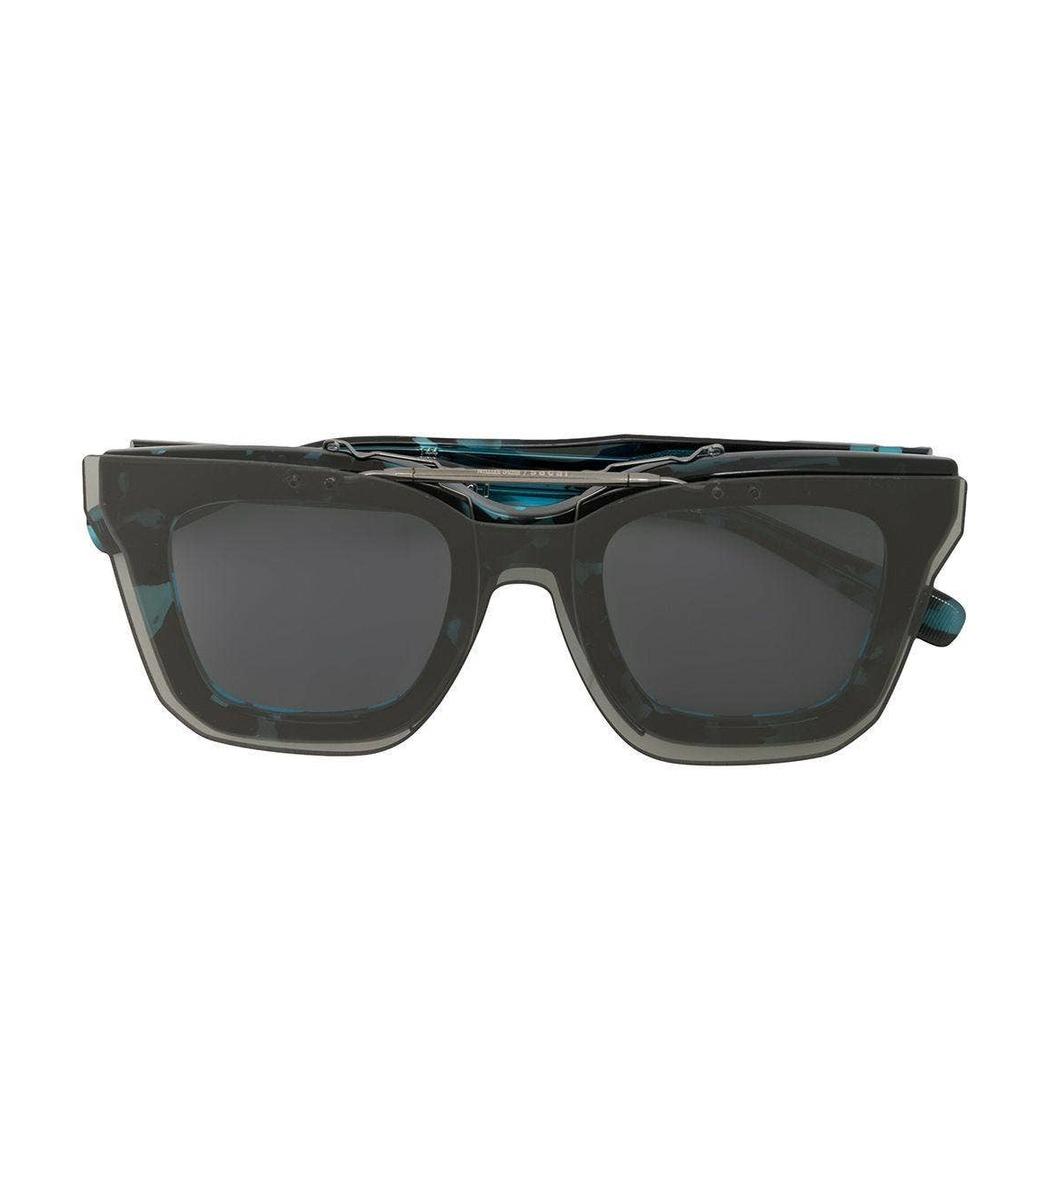 Sacai Black And Blue Tortoiseshell Sunglasses